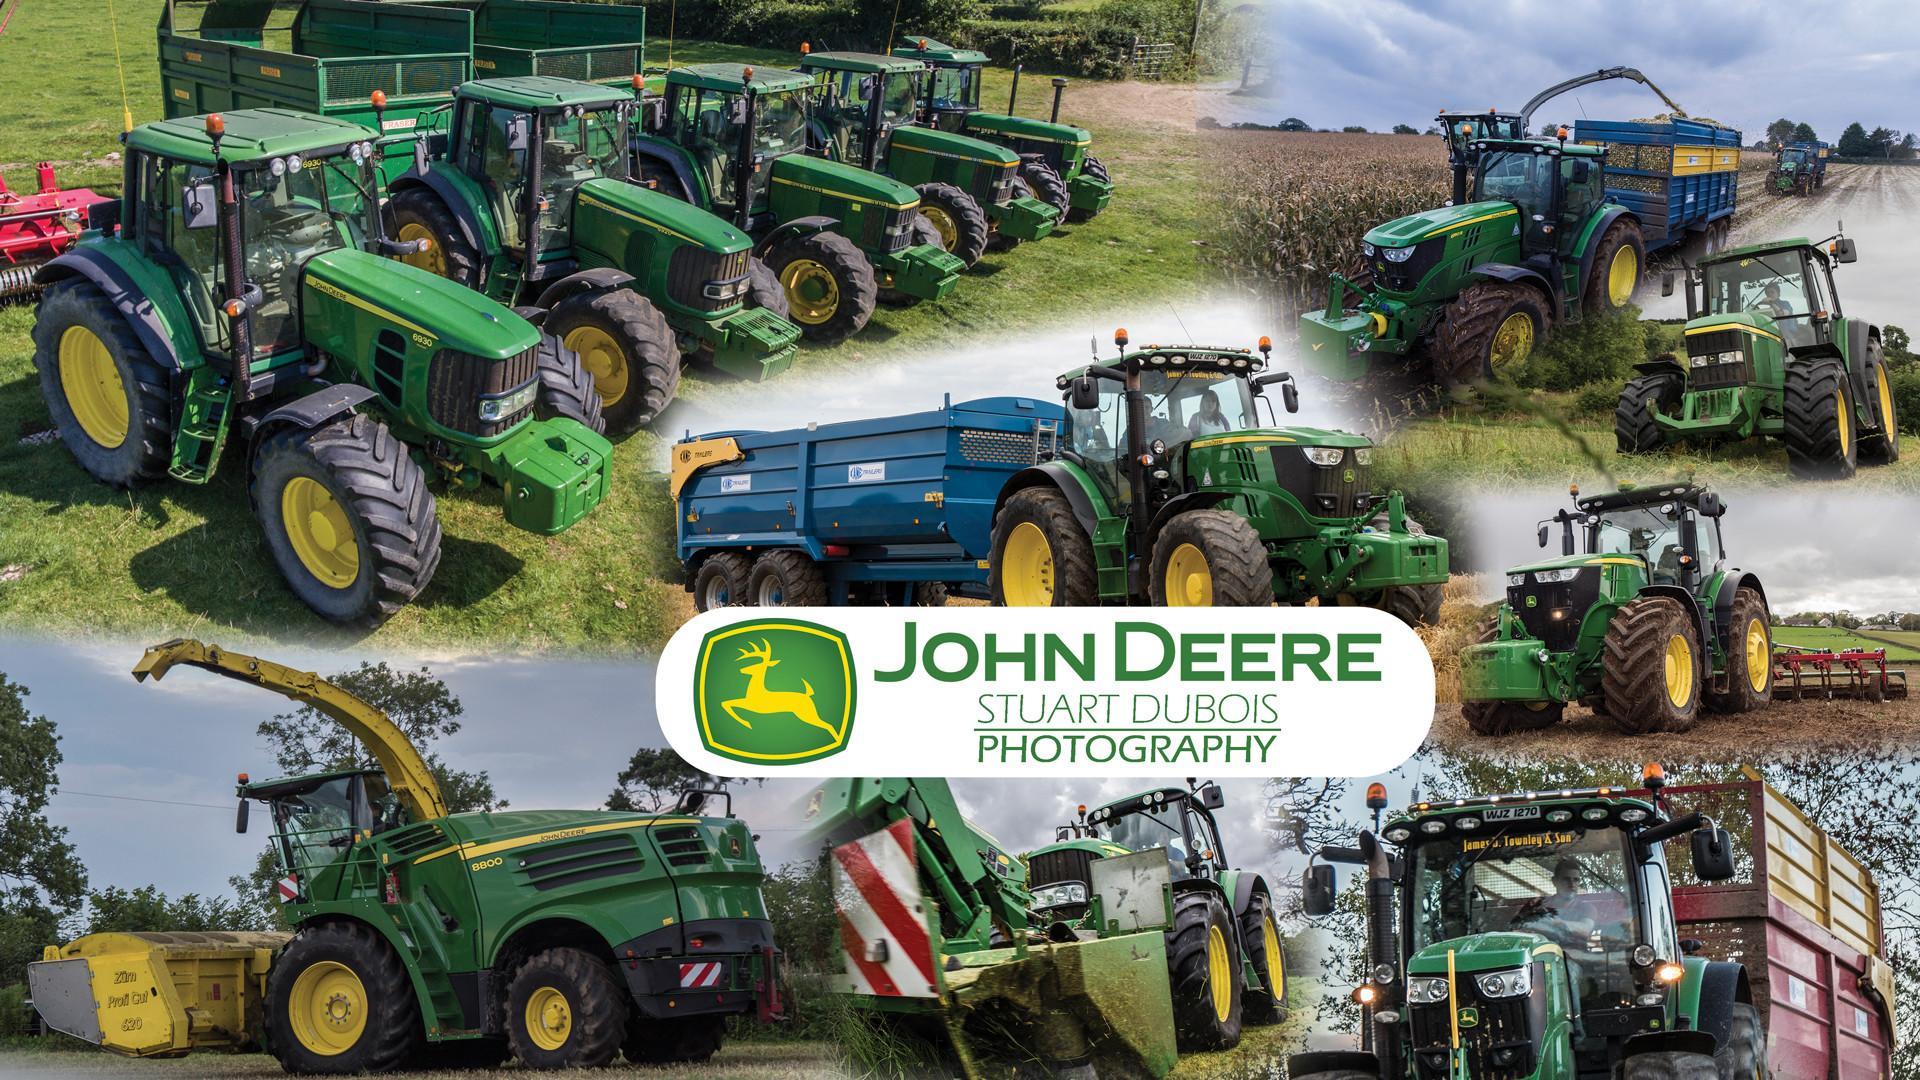 HD John Deere Wallpaper (64+ images)